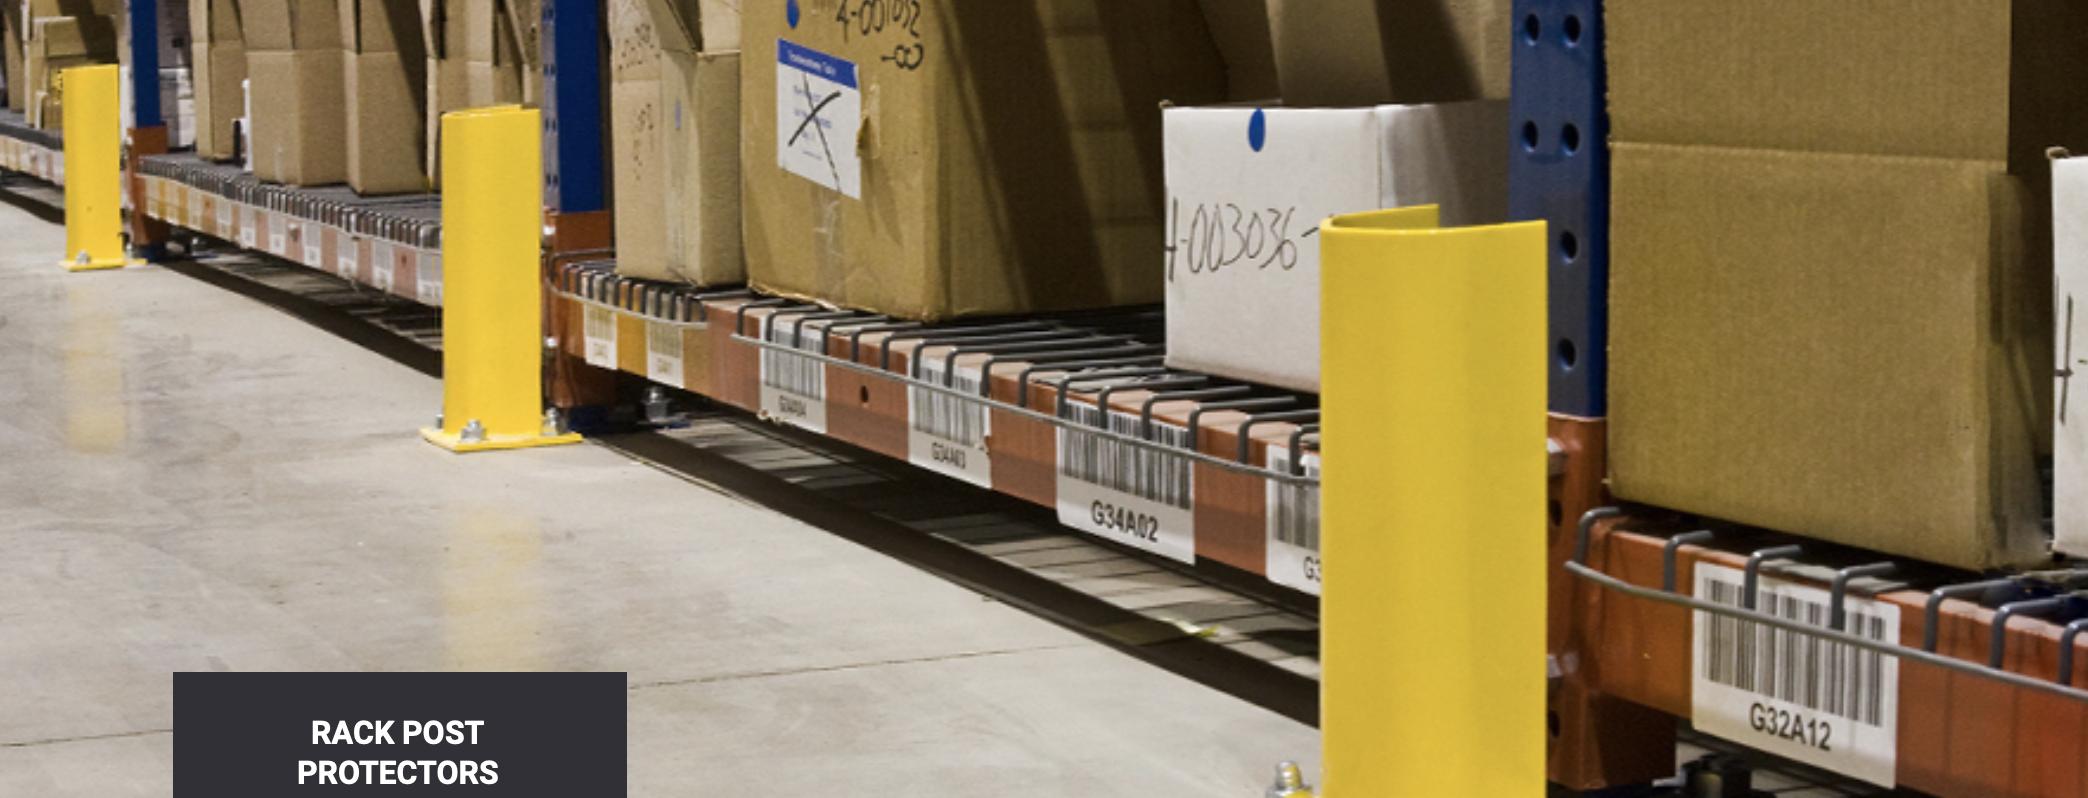 yellow rack post protectors guarding warehouse pallet racks